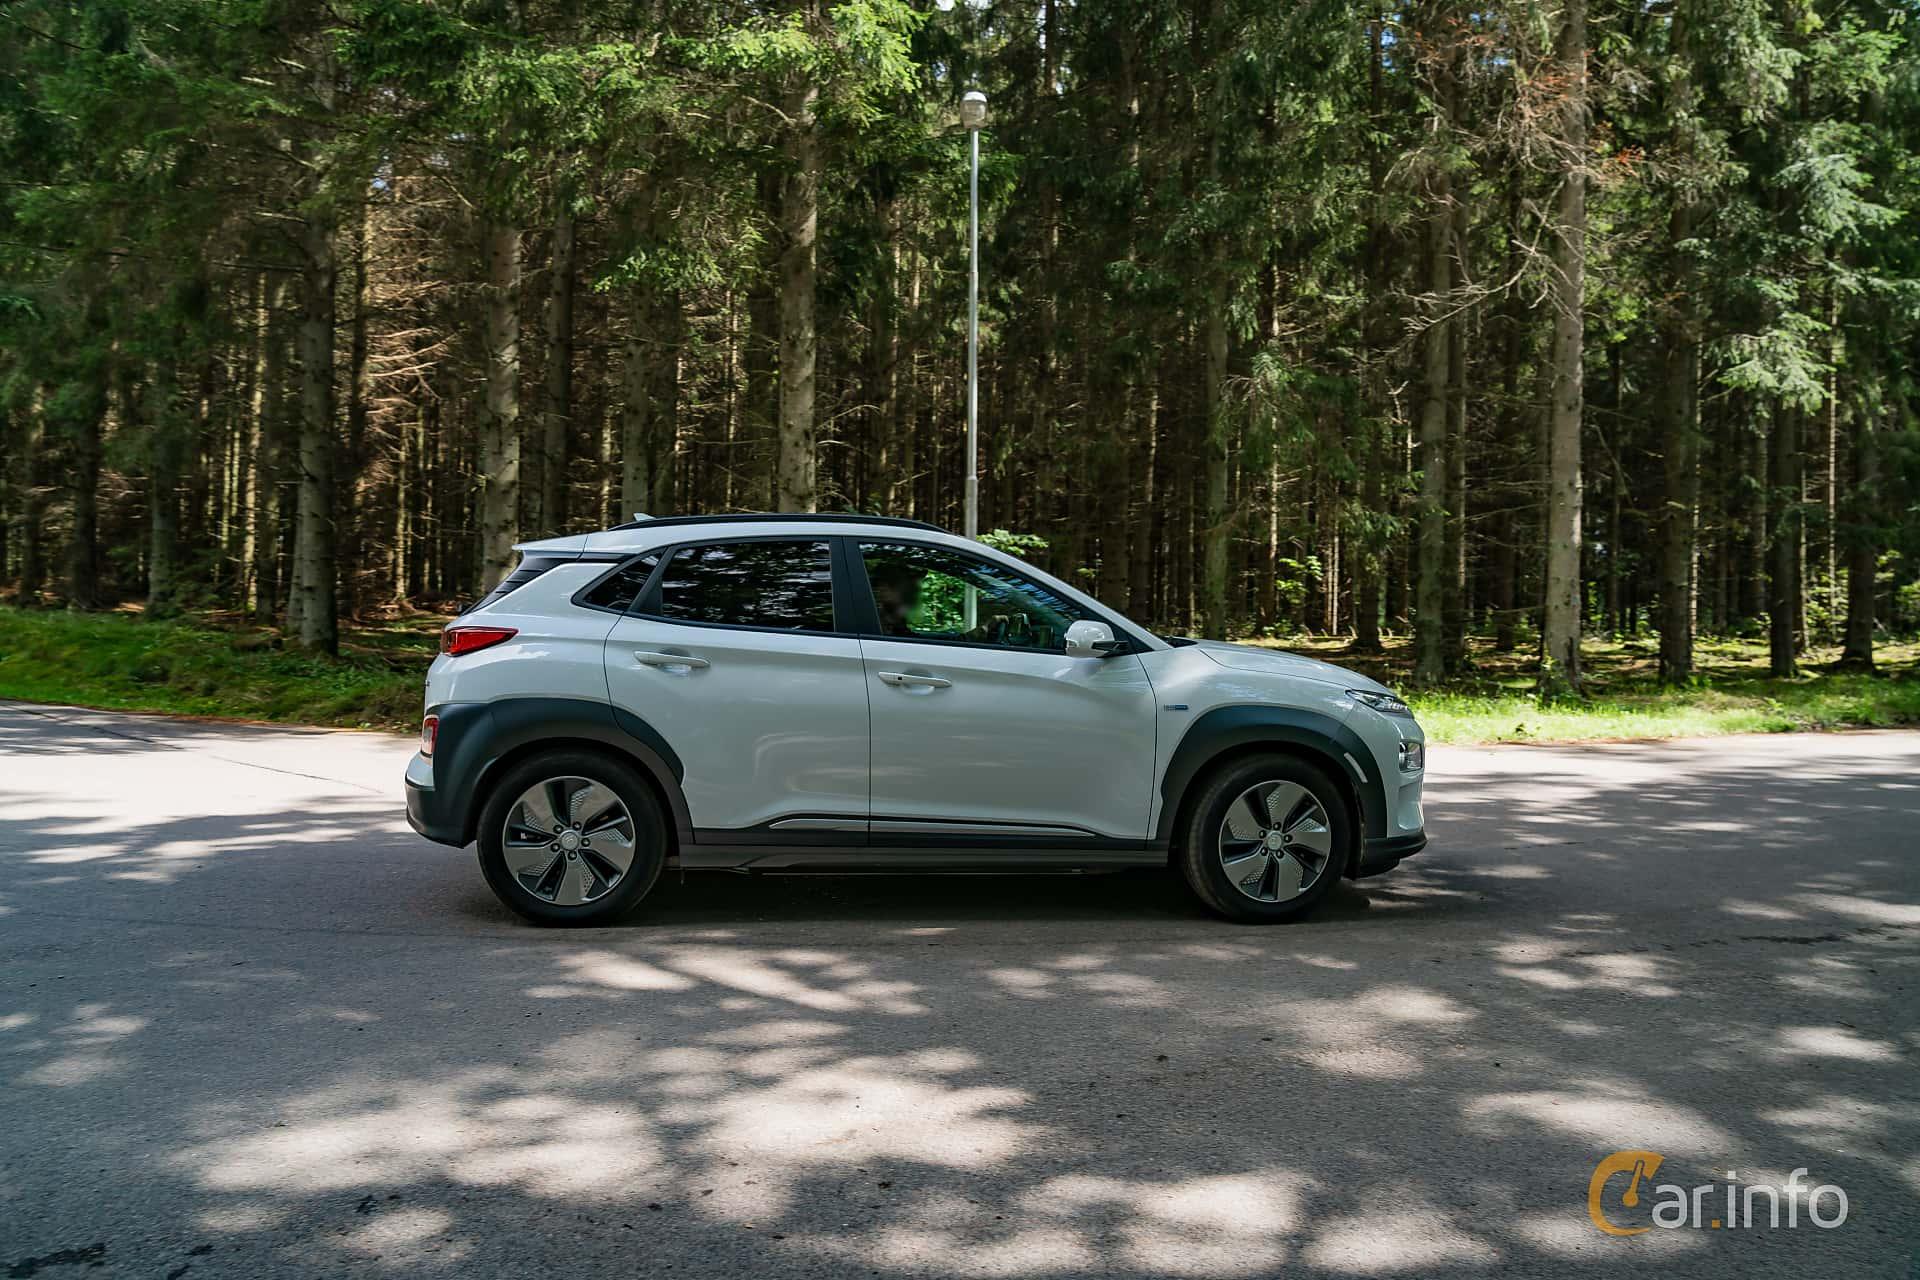 Side  of Hyundai Kona Electric 64 kWh Single Speed, 204ps, 2019 at Svenskt sportvagnsmeeting 2019